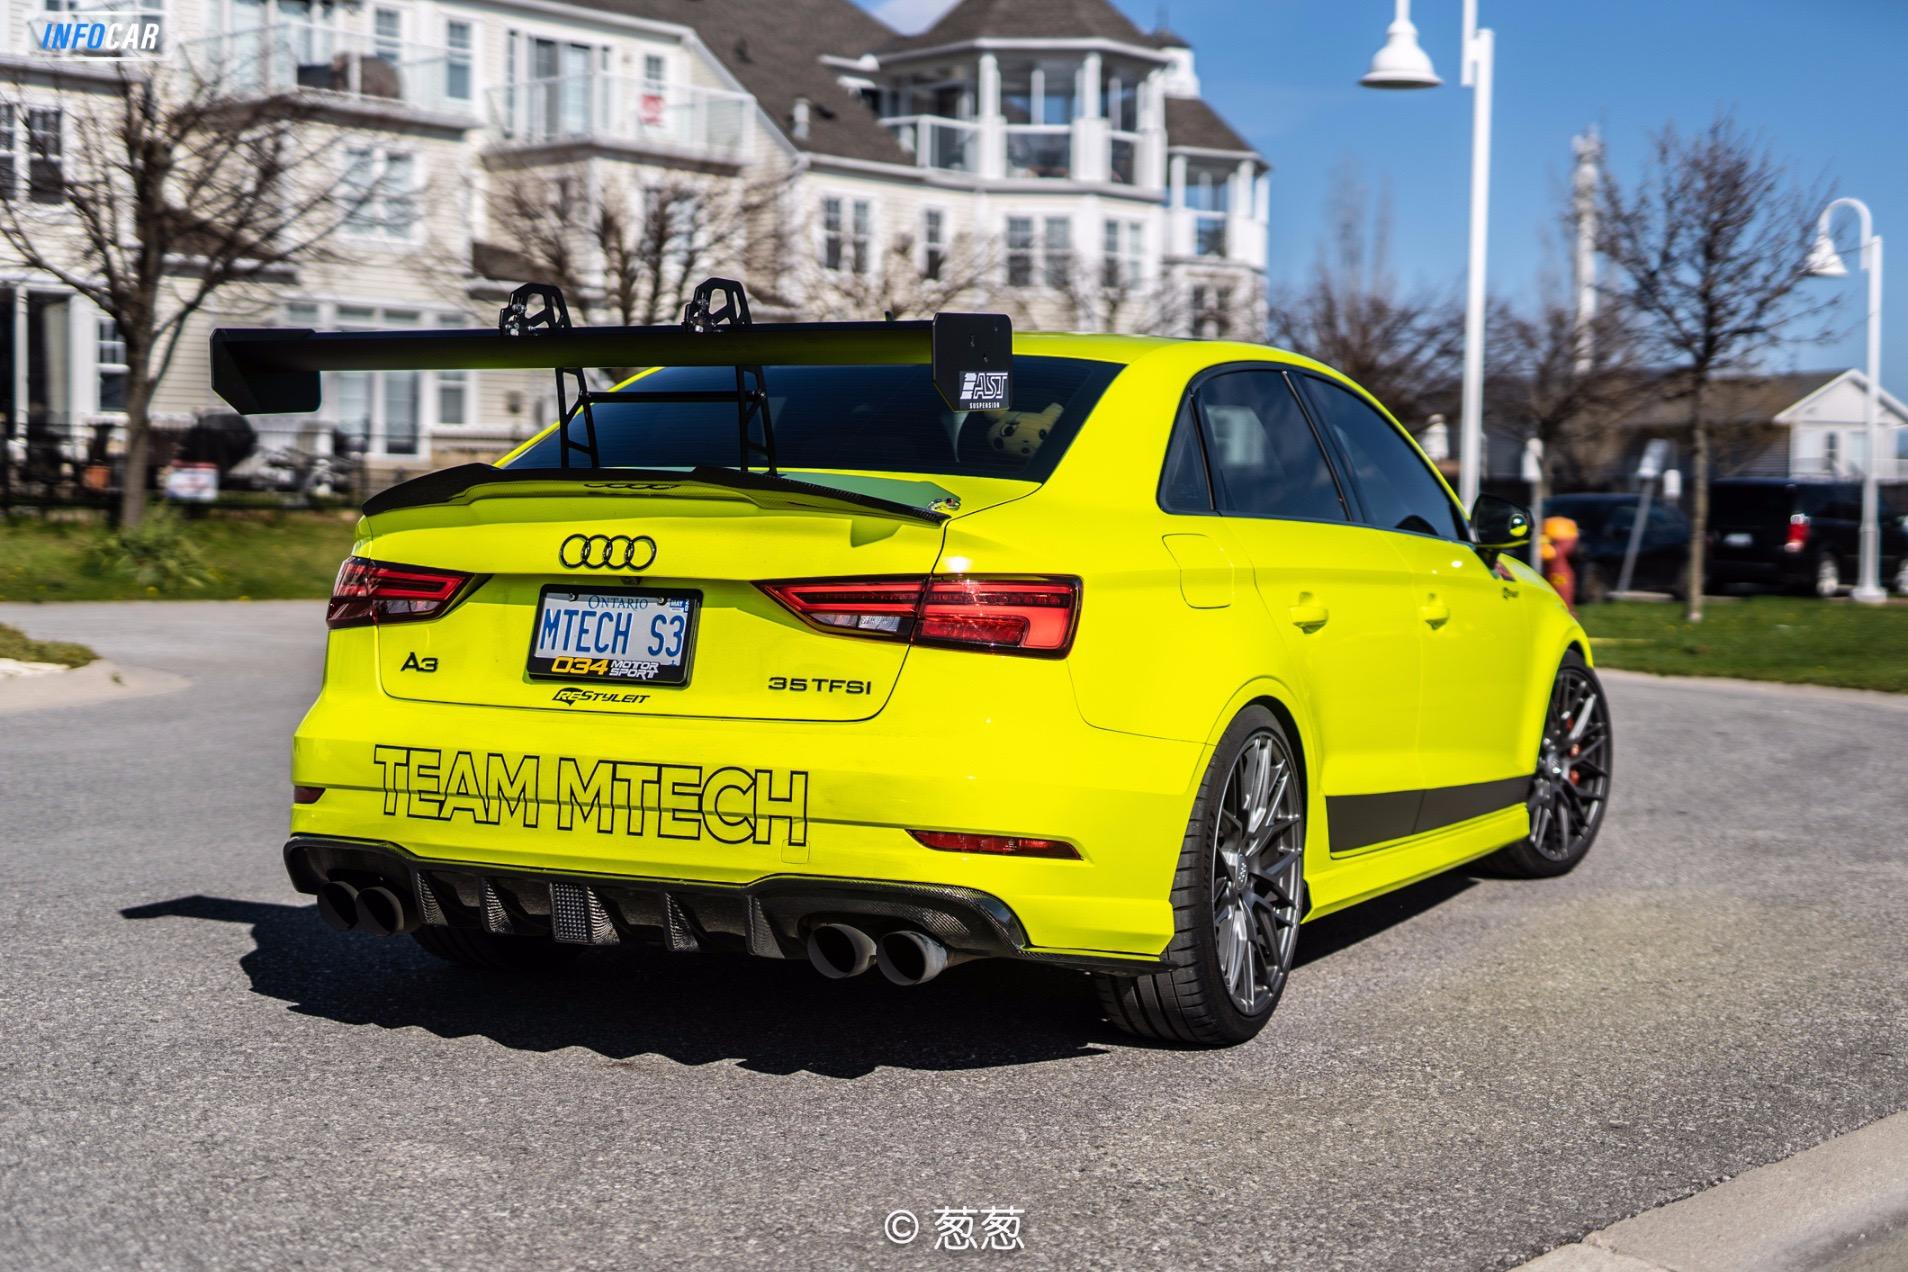 2018 Audi S3  - INFOCAR - Toronto's Most Comprehensive New and Used Auto Trading Platform